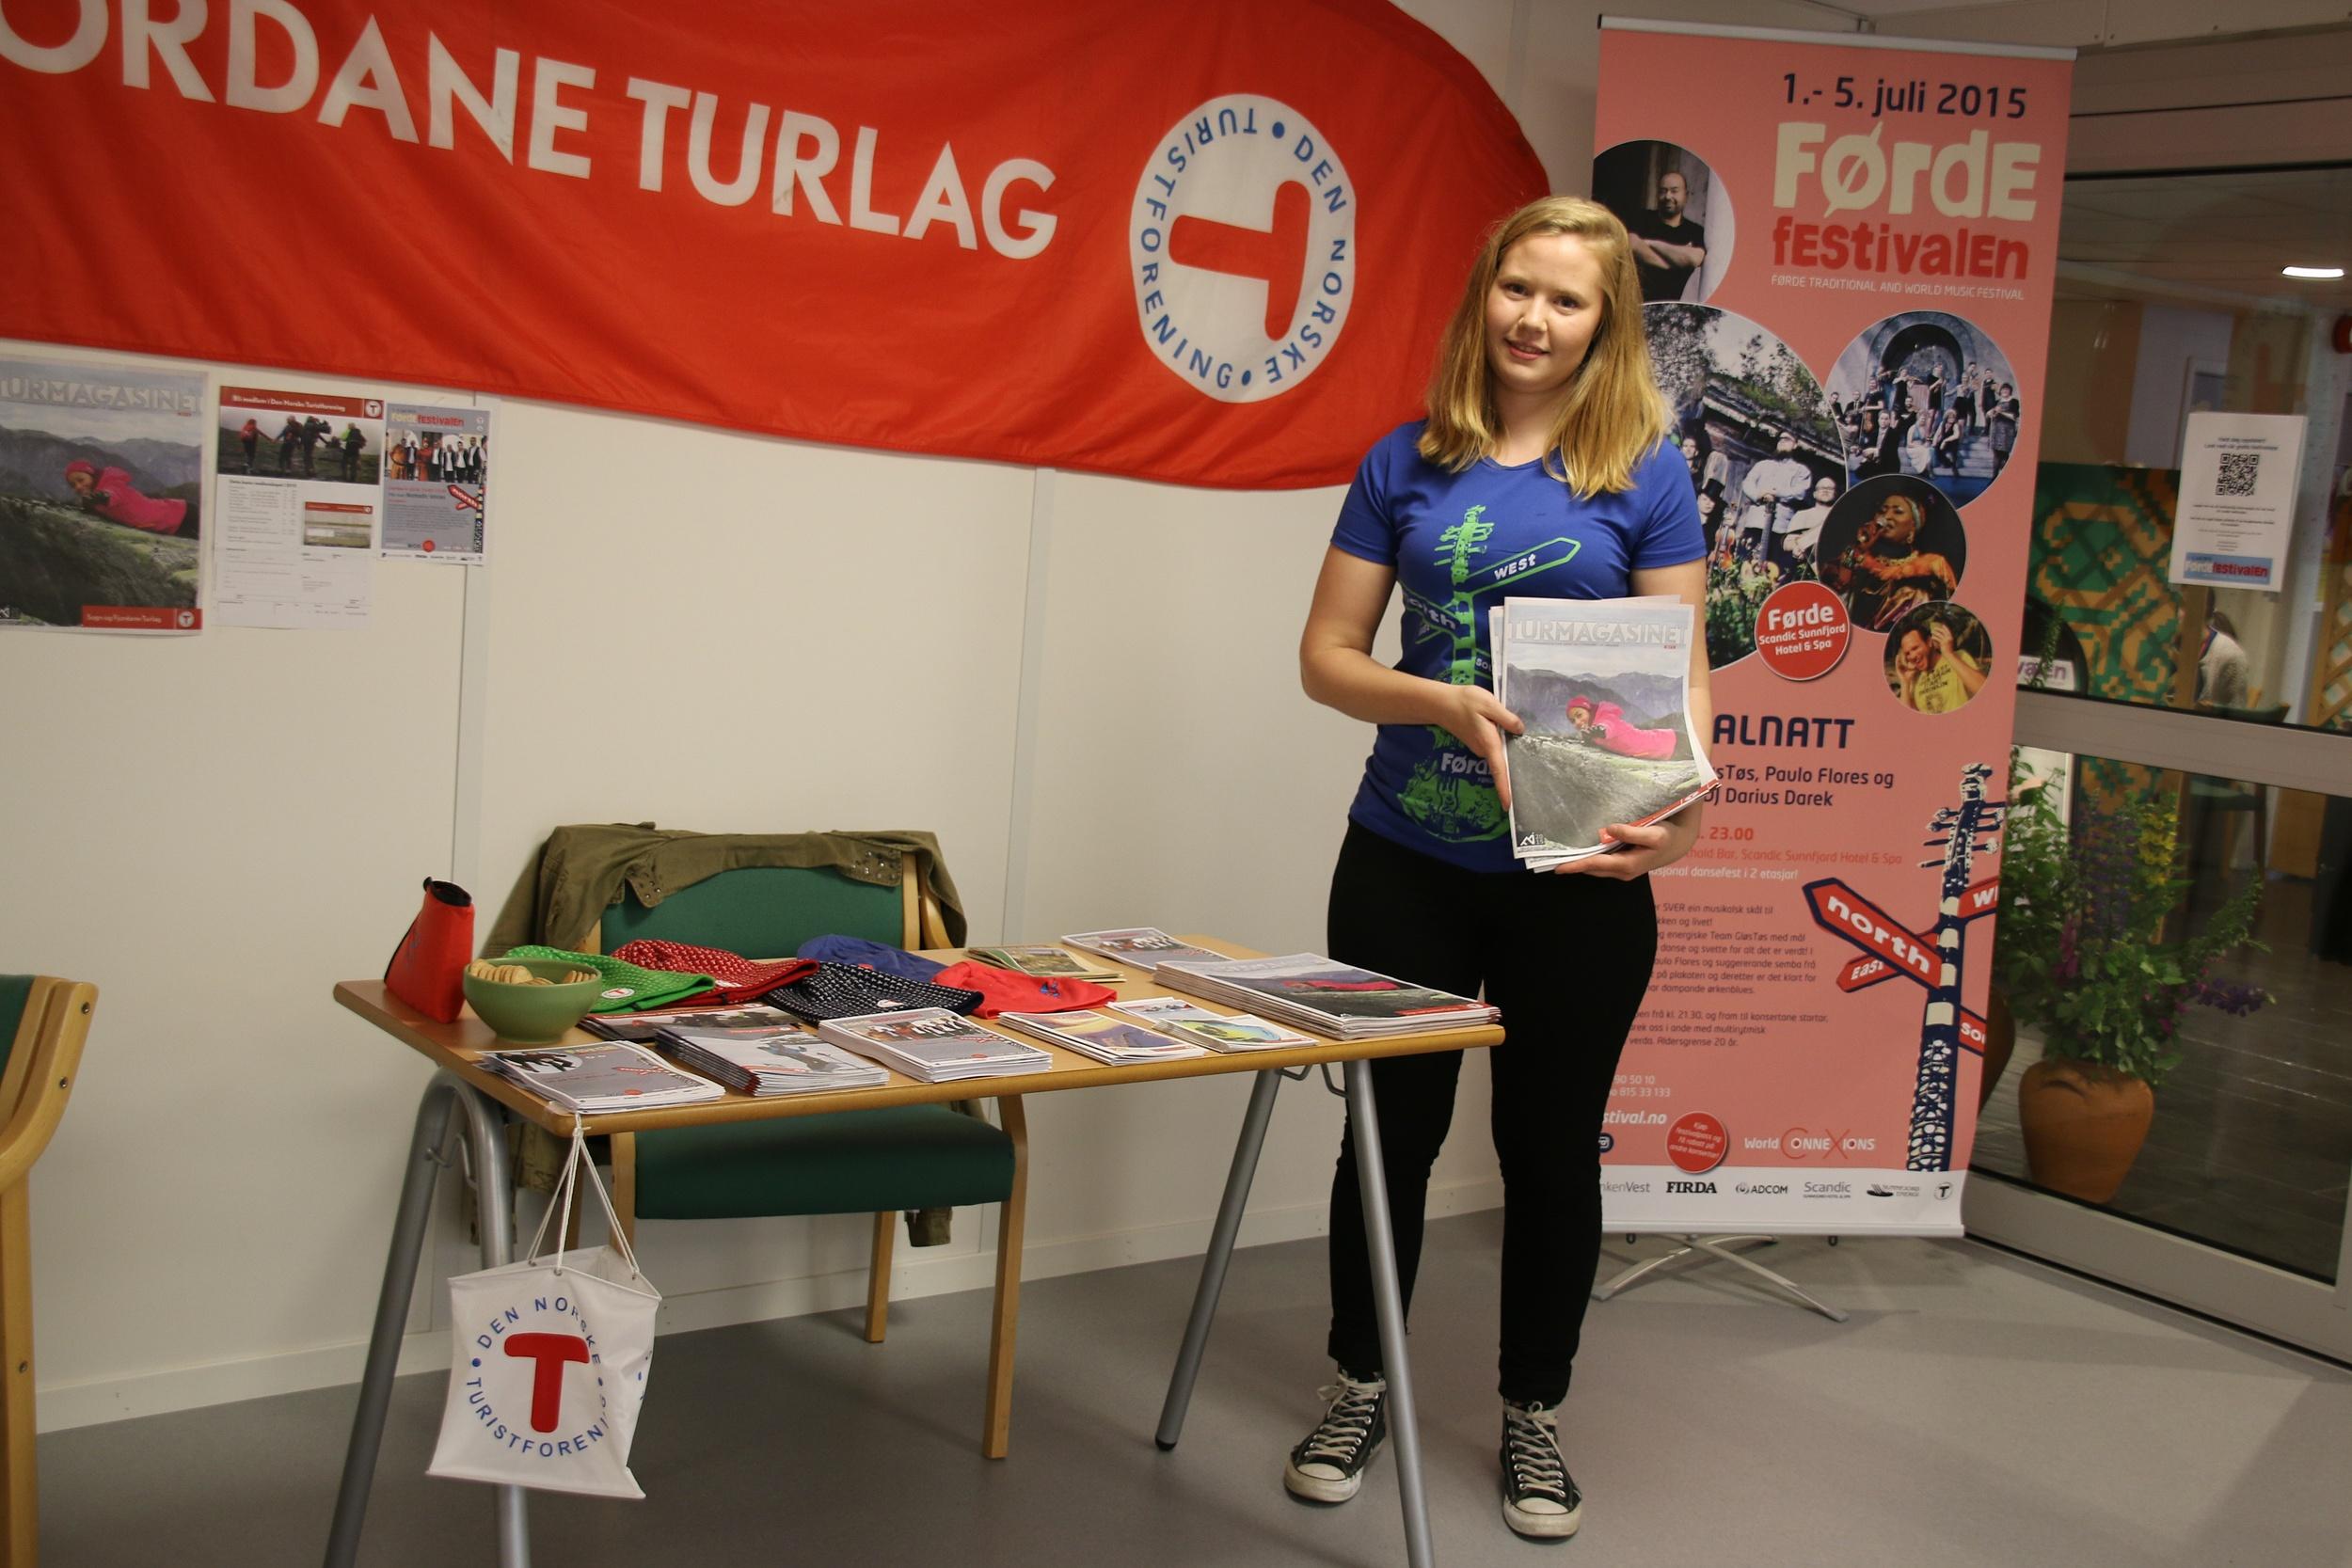 2015_frivillige_F+©rdehuset_Celine Solheim (7).JPG